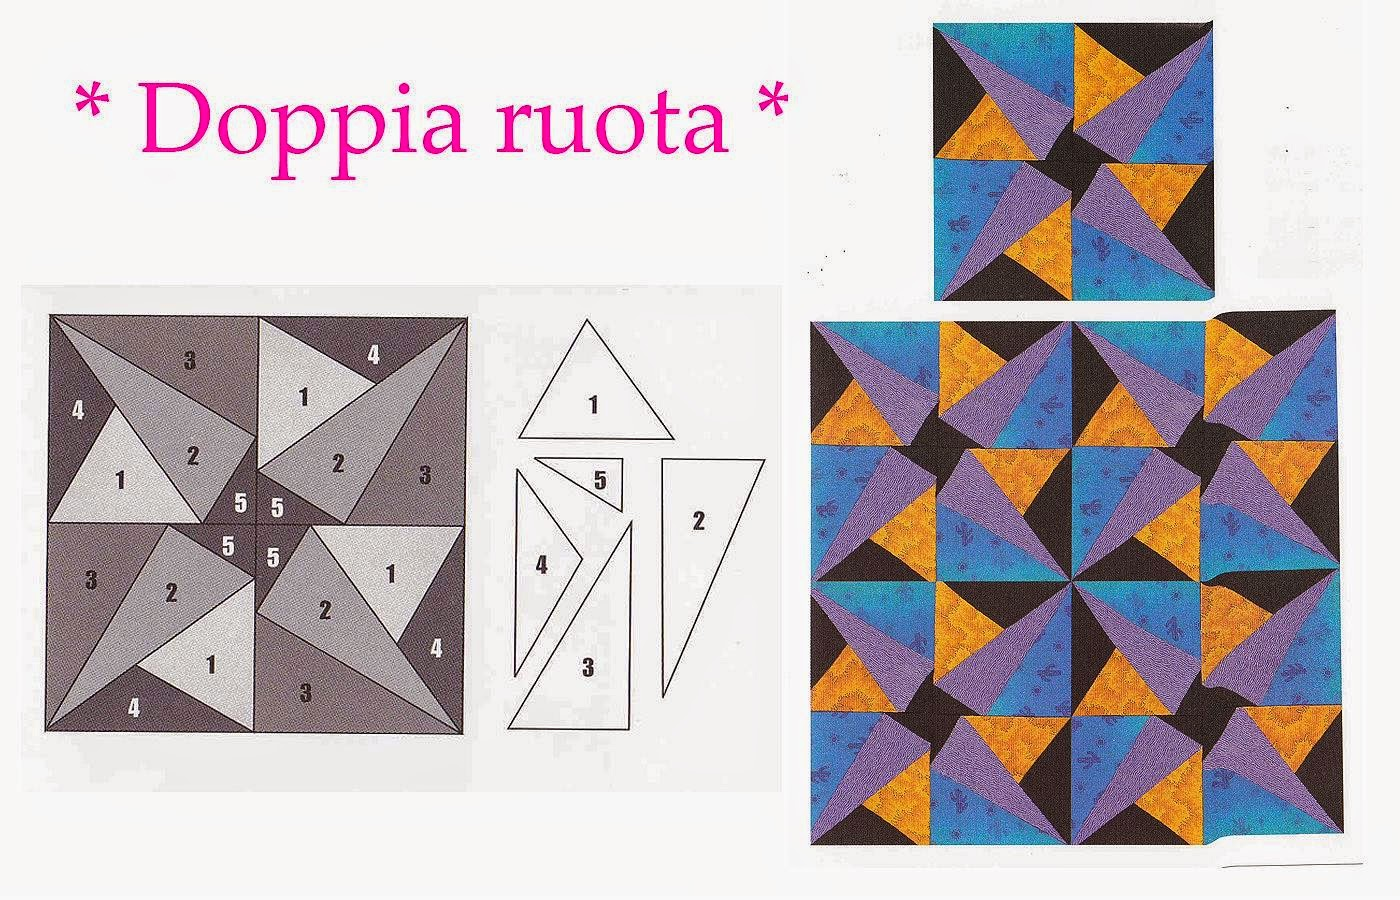 schema patchwork fai da te,hobby patchwork